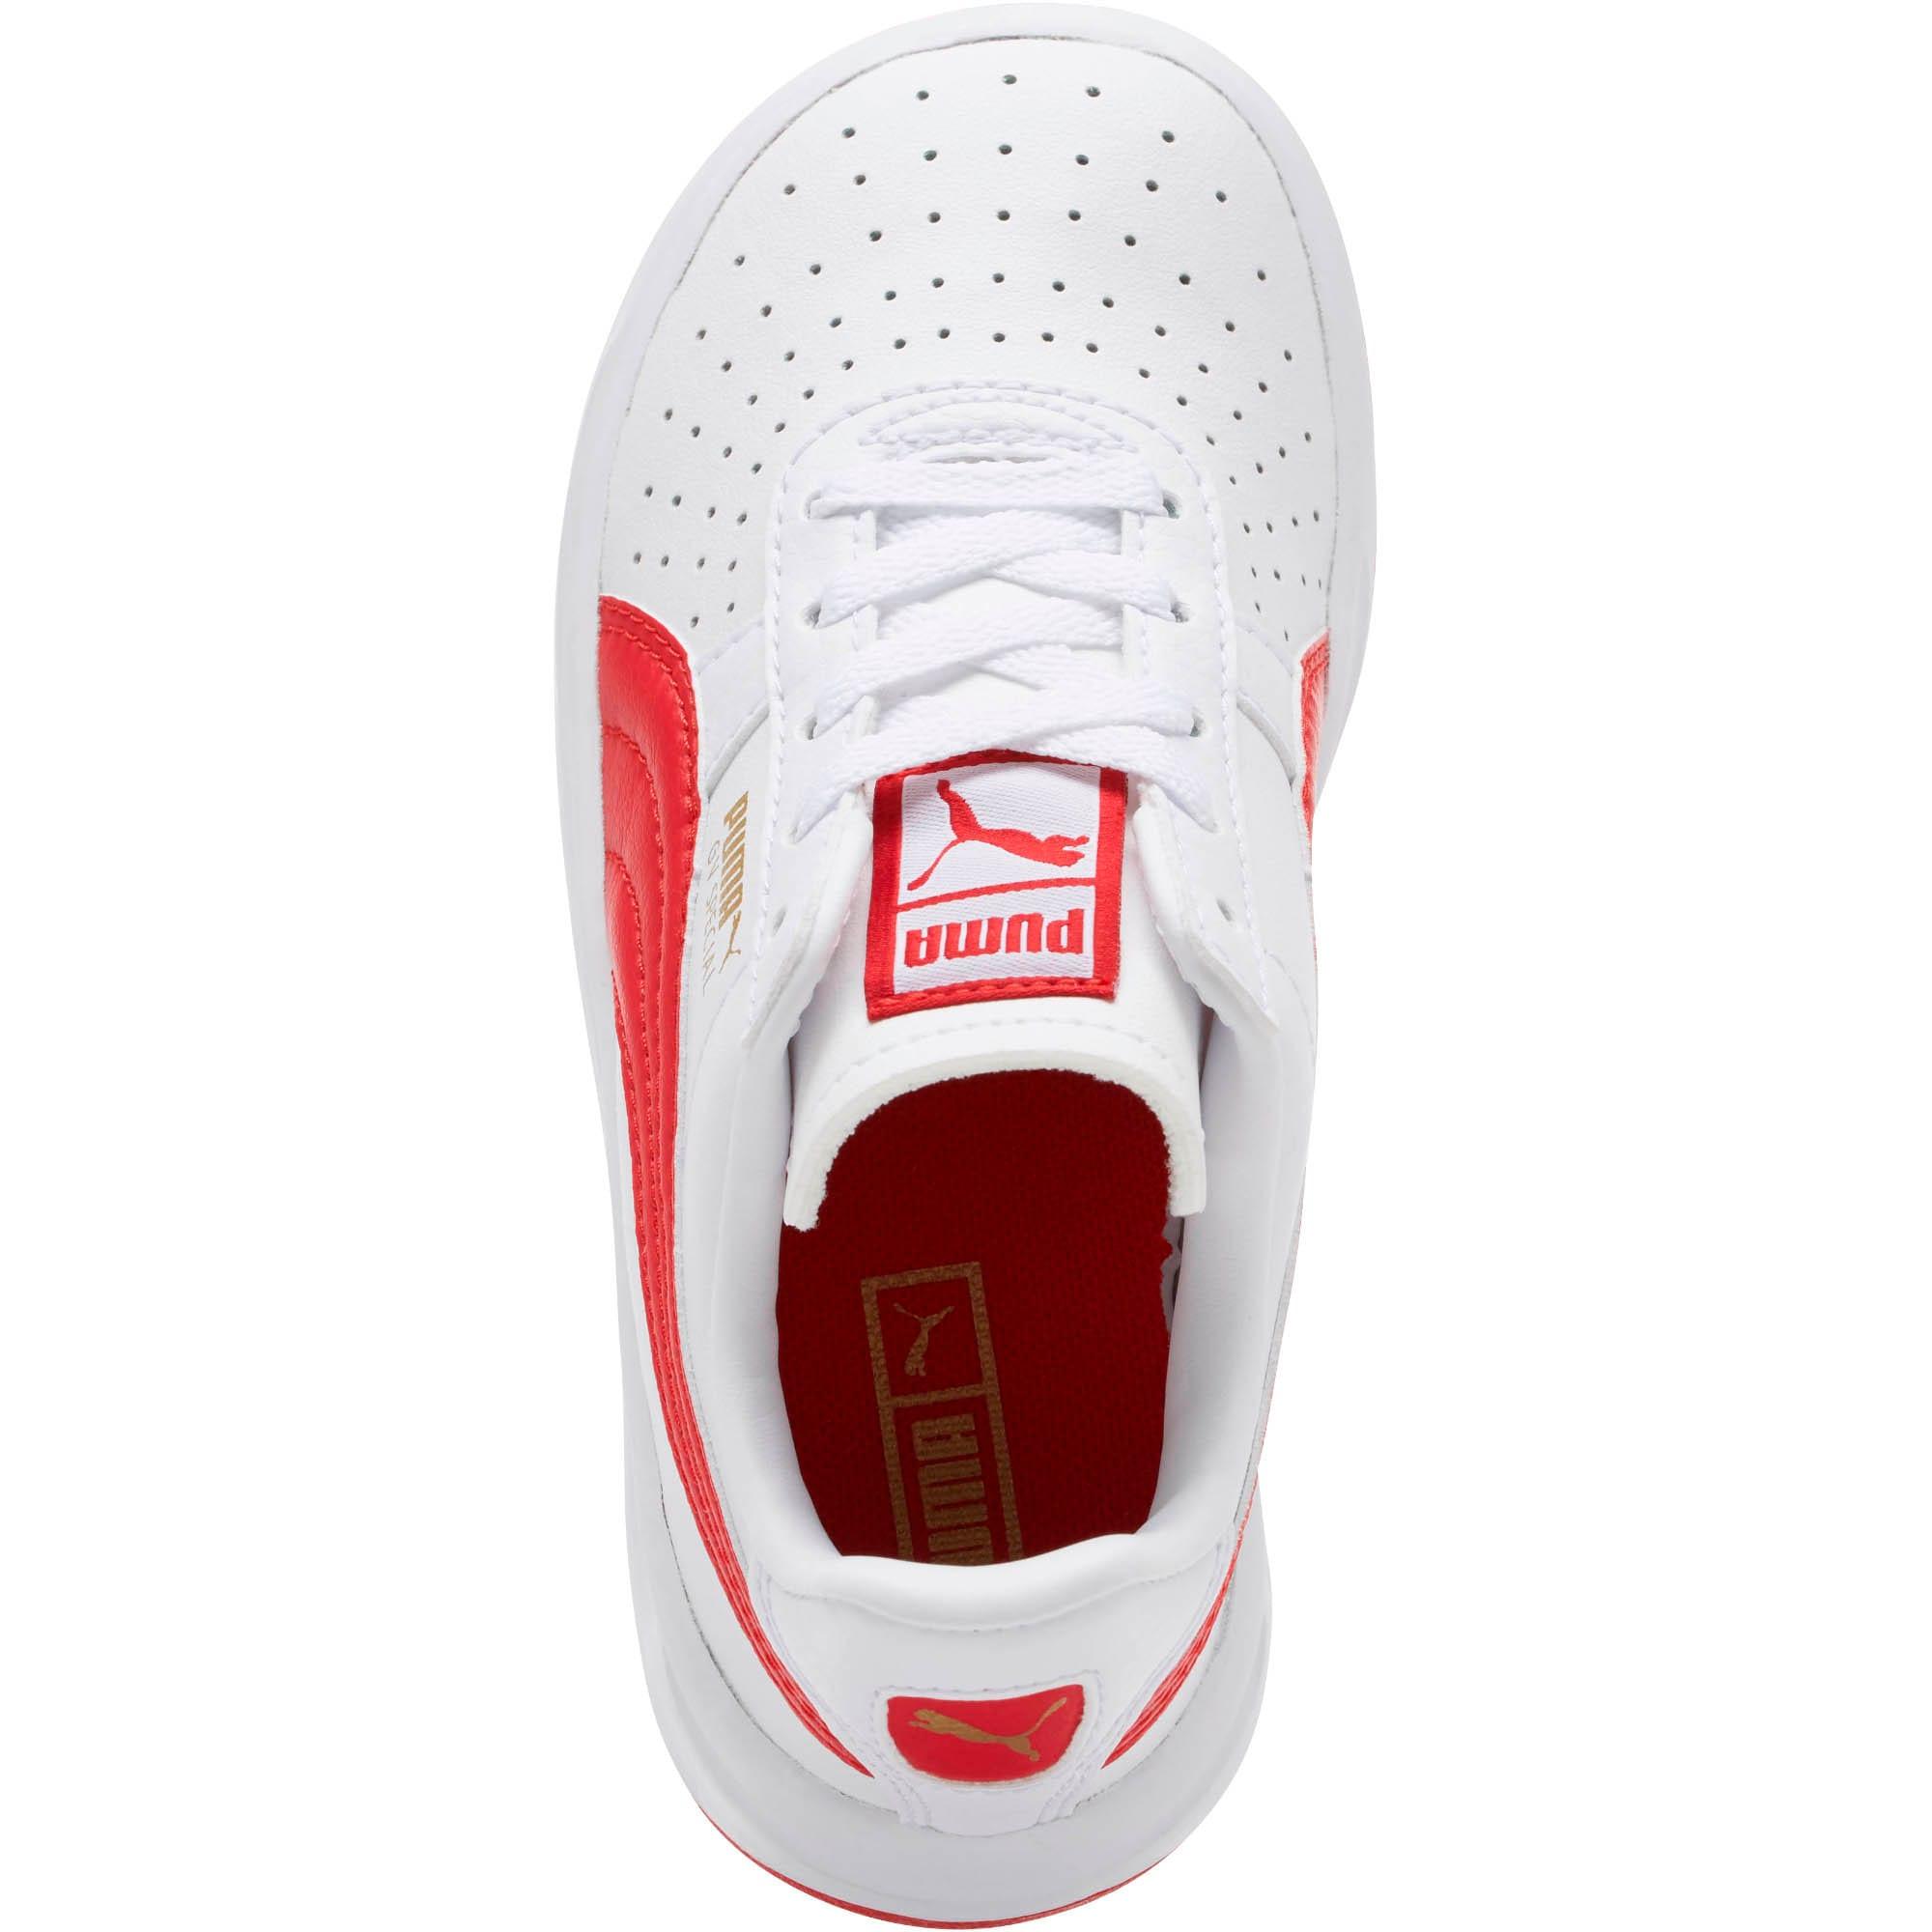 Thumbnail 5 of GV Special Little Kids' Shoes, Puma White-Ribbon Red, medium